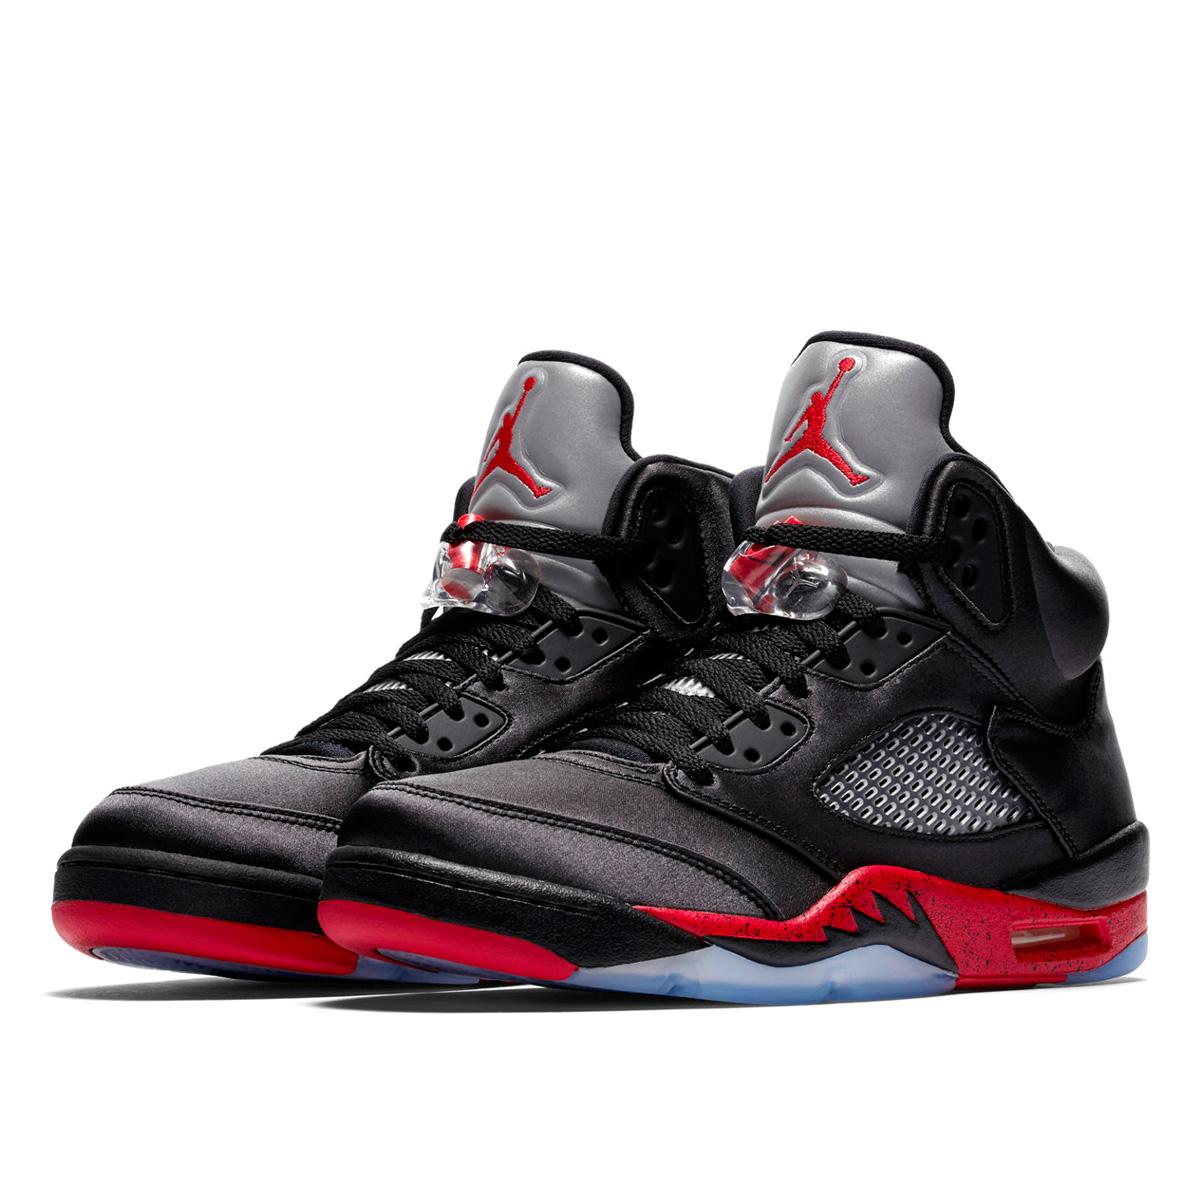 new product c761c 5bde4 NIKE AIR JORDAN 5 RETRO Nike Air Jordan 5 nostalgic SATIN BLACK/UNIVERSITY  RED 136,027-006